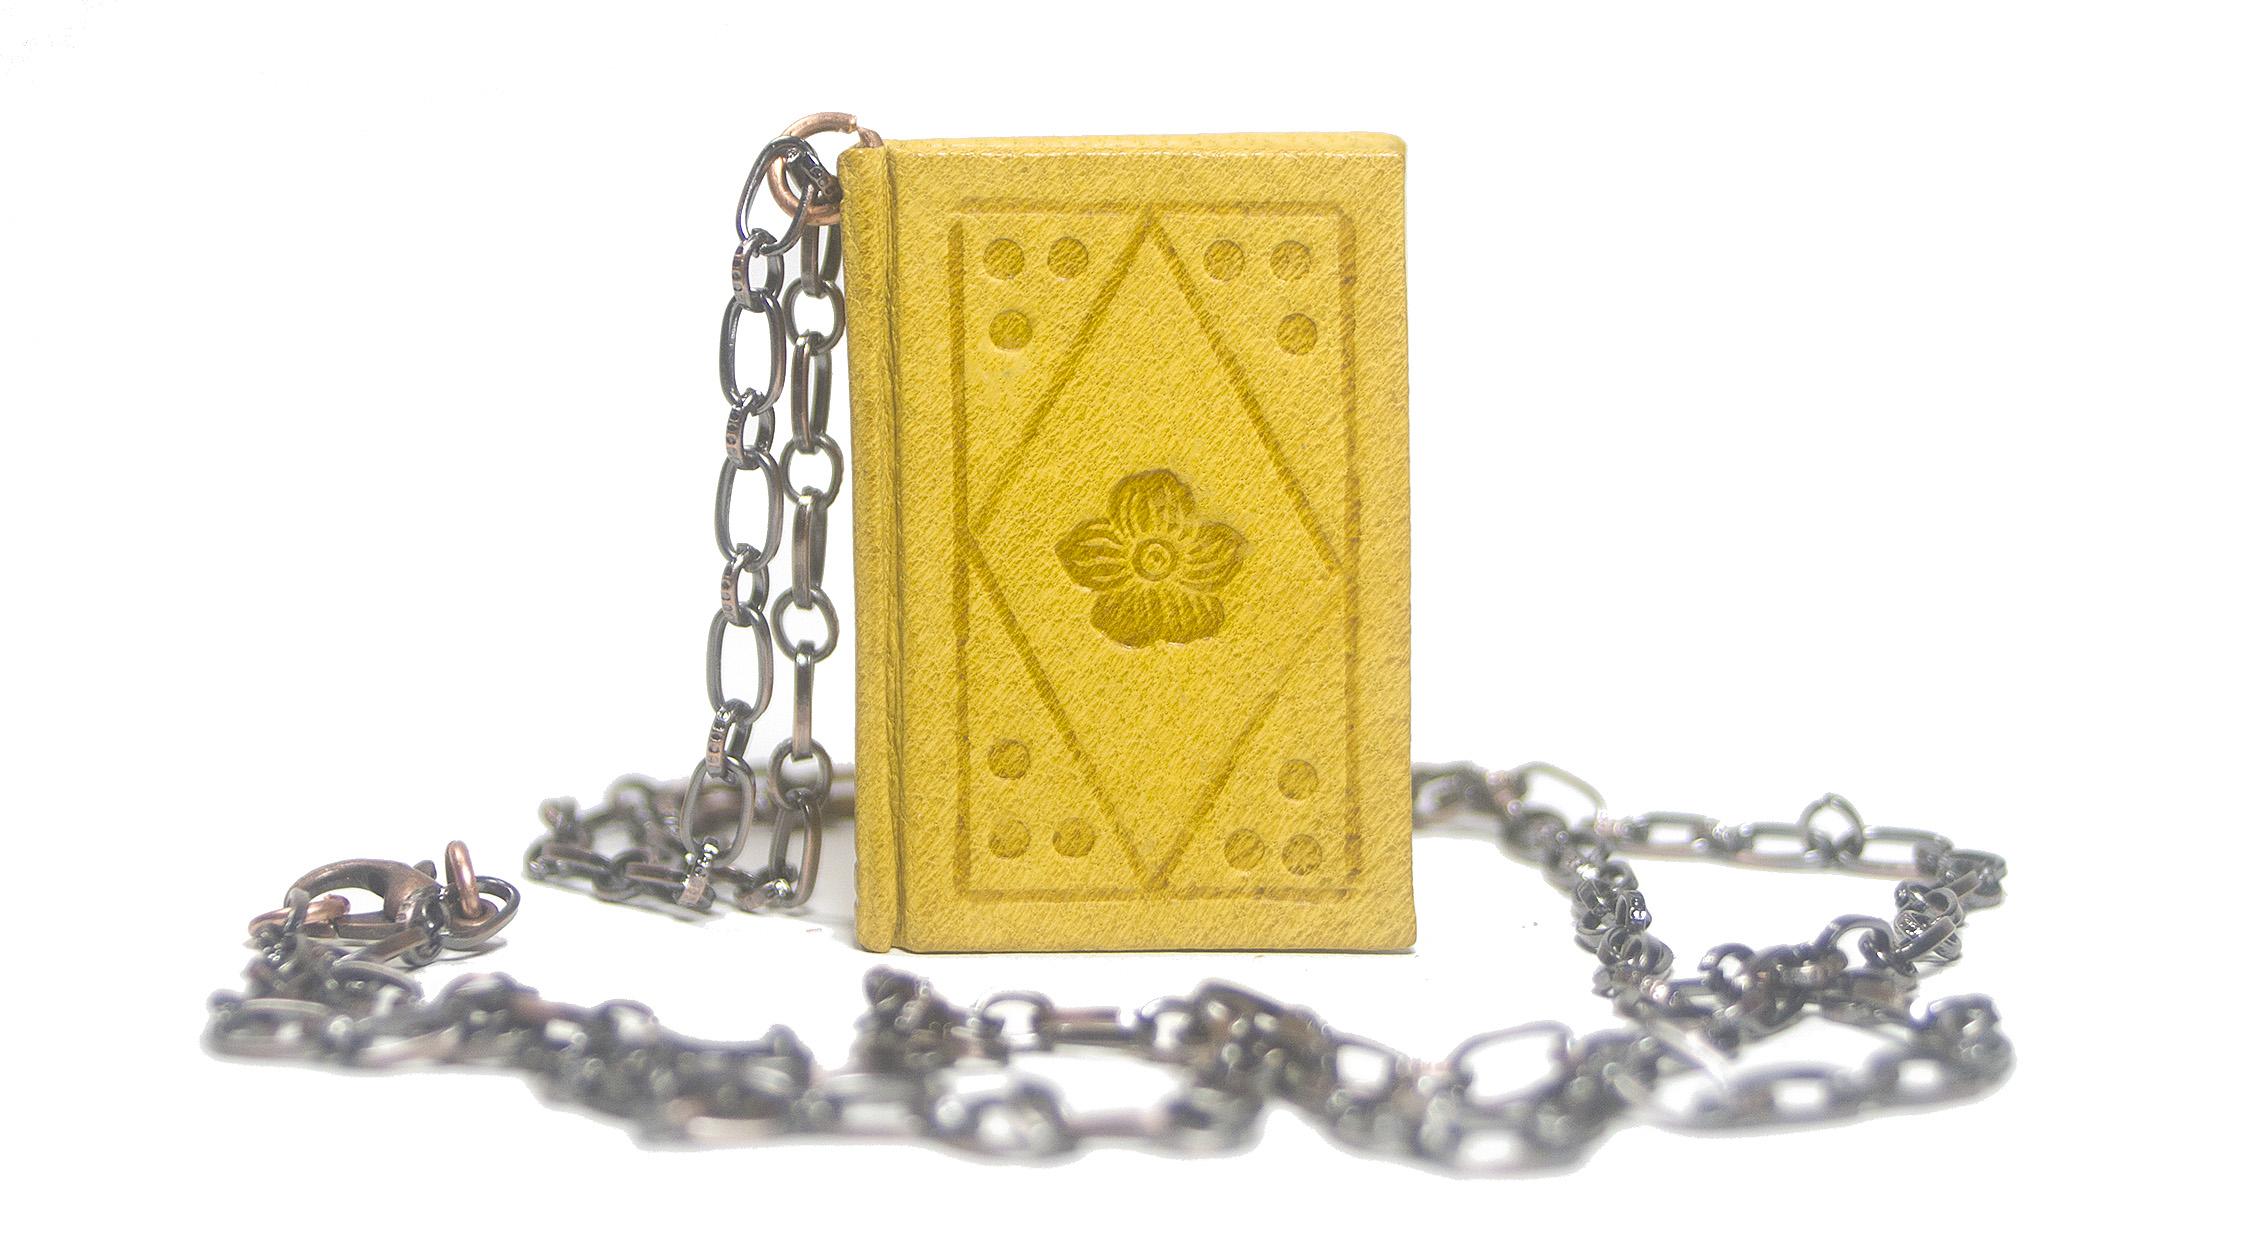 Handmade Leather Book Pendant Necklace